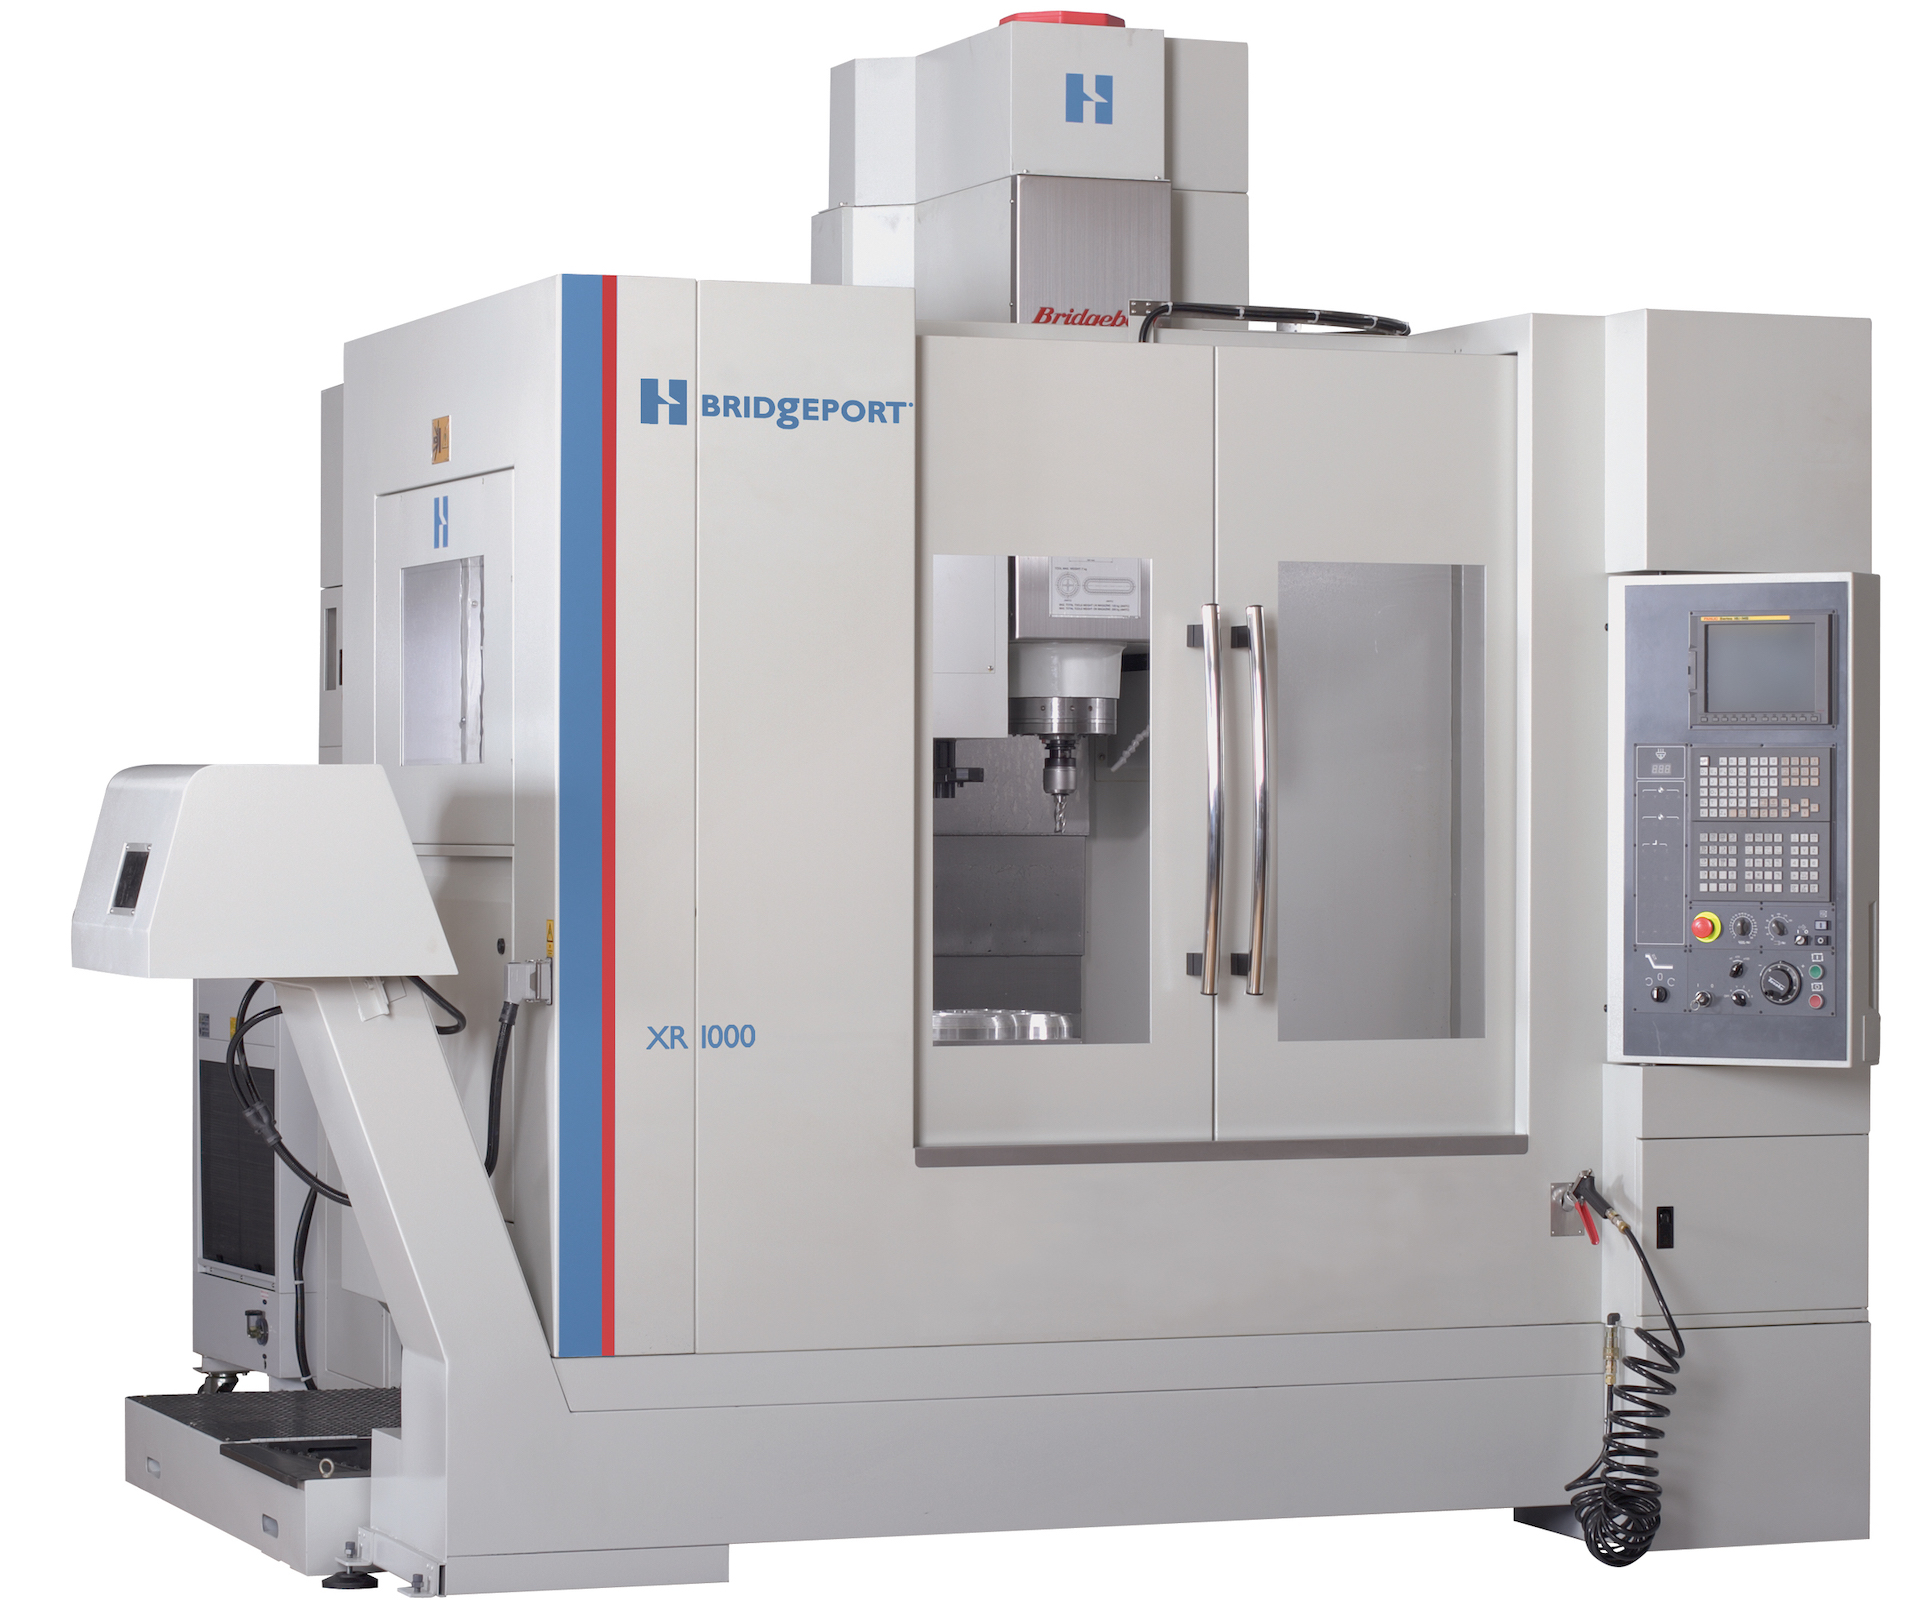 https://www.metalite.co.uk/wp-content/uploads/capabilities/milling/Hardimg-XR_1000-3-axis-mill.jpg